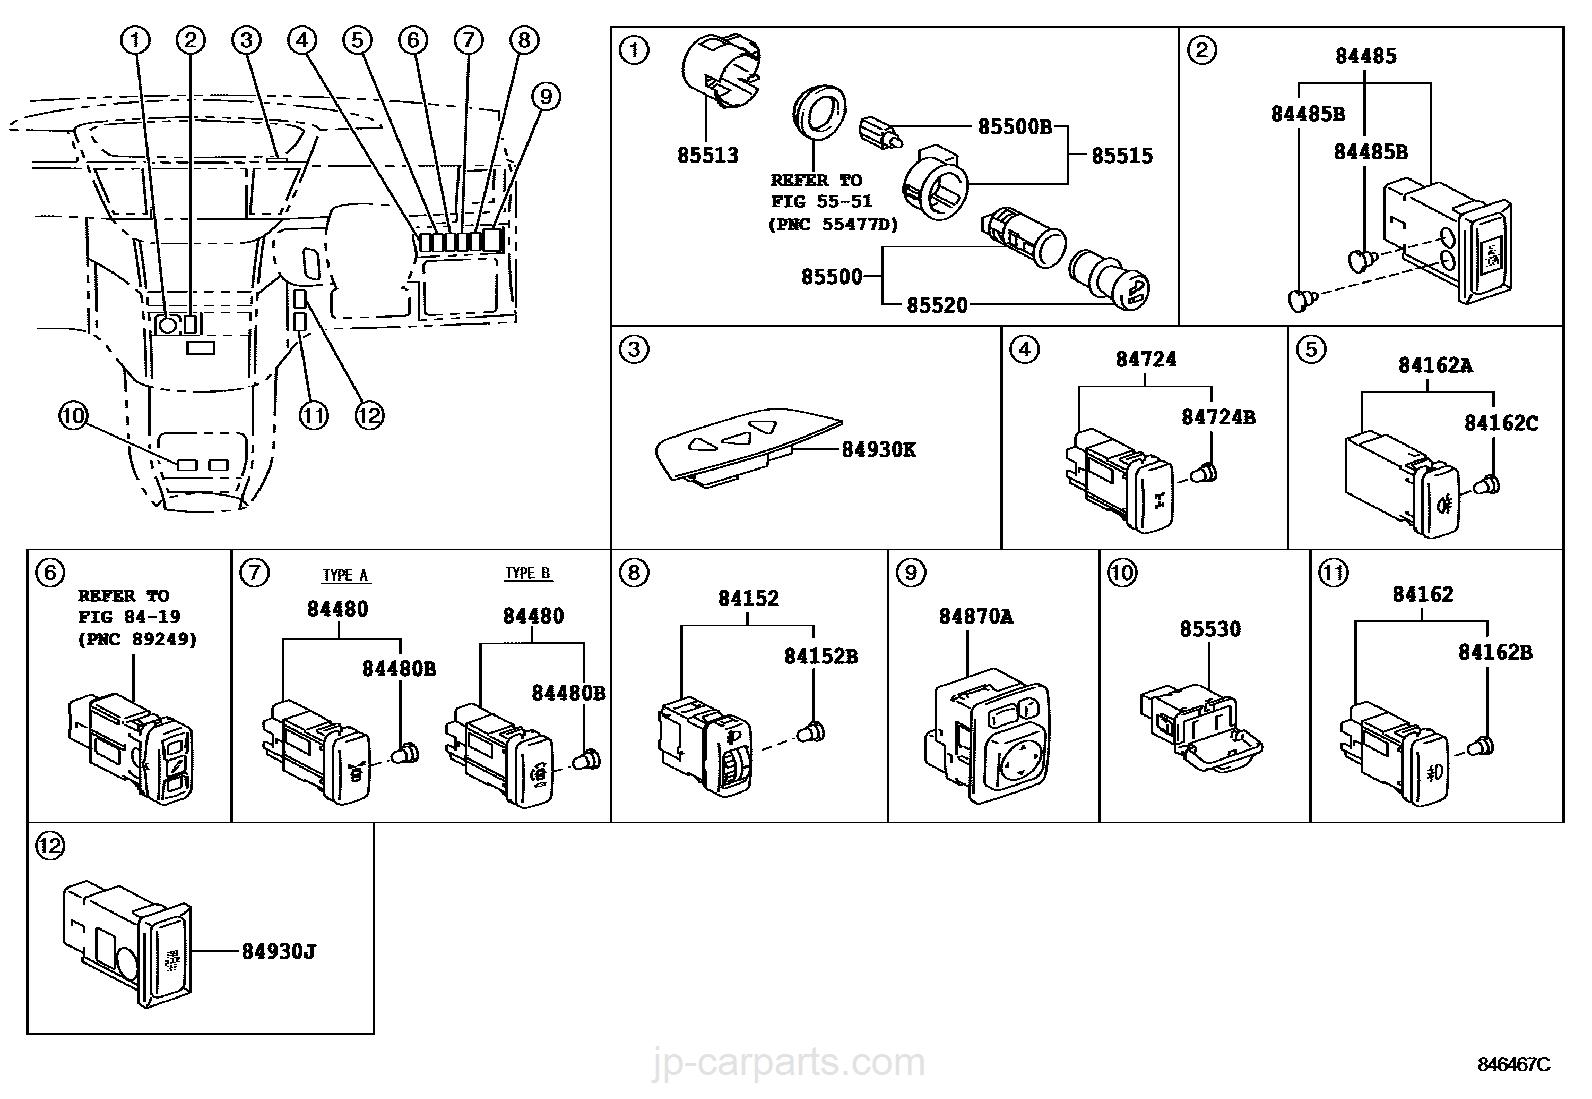 hight resolution of 2004 toyota rav4 fuse box